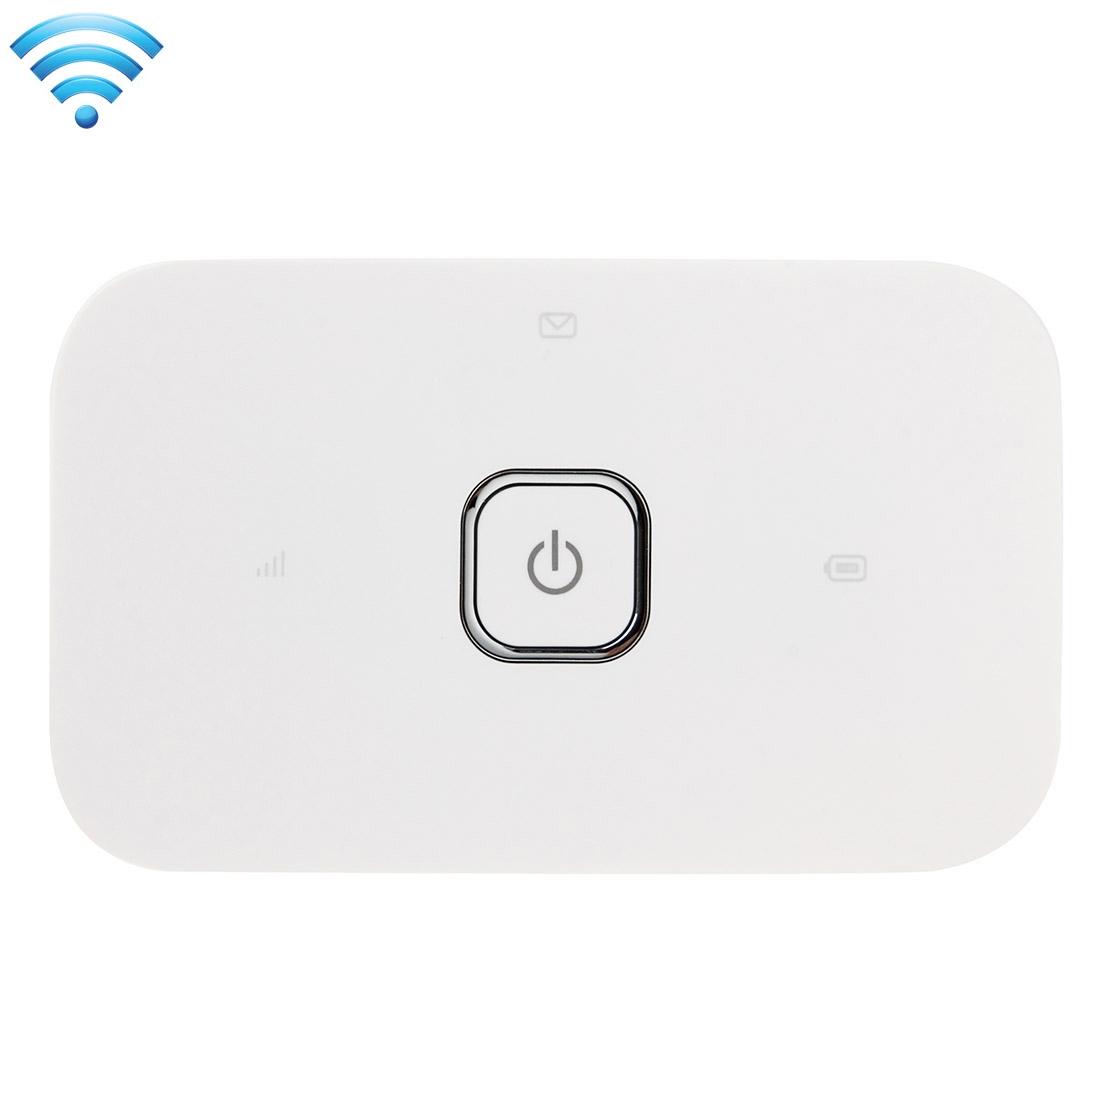 Huawei Vodafone Mobile WiFi Hotspot R216 Pocket WiFi 4G